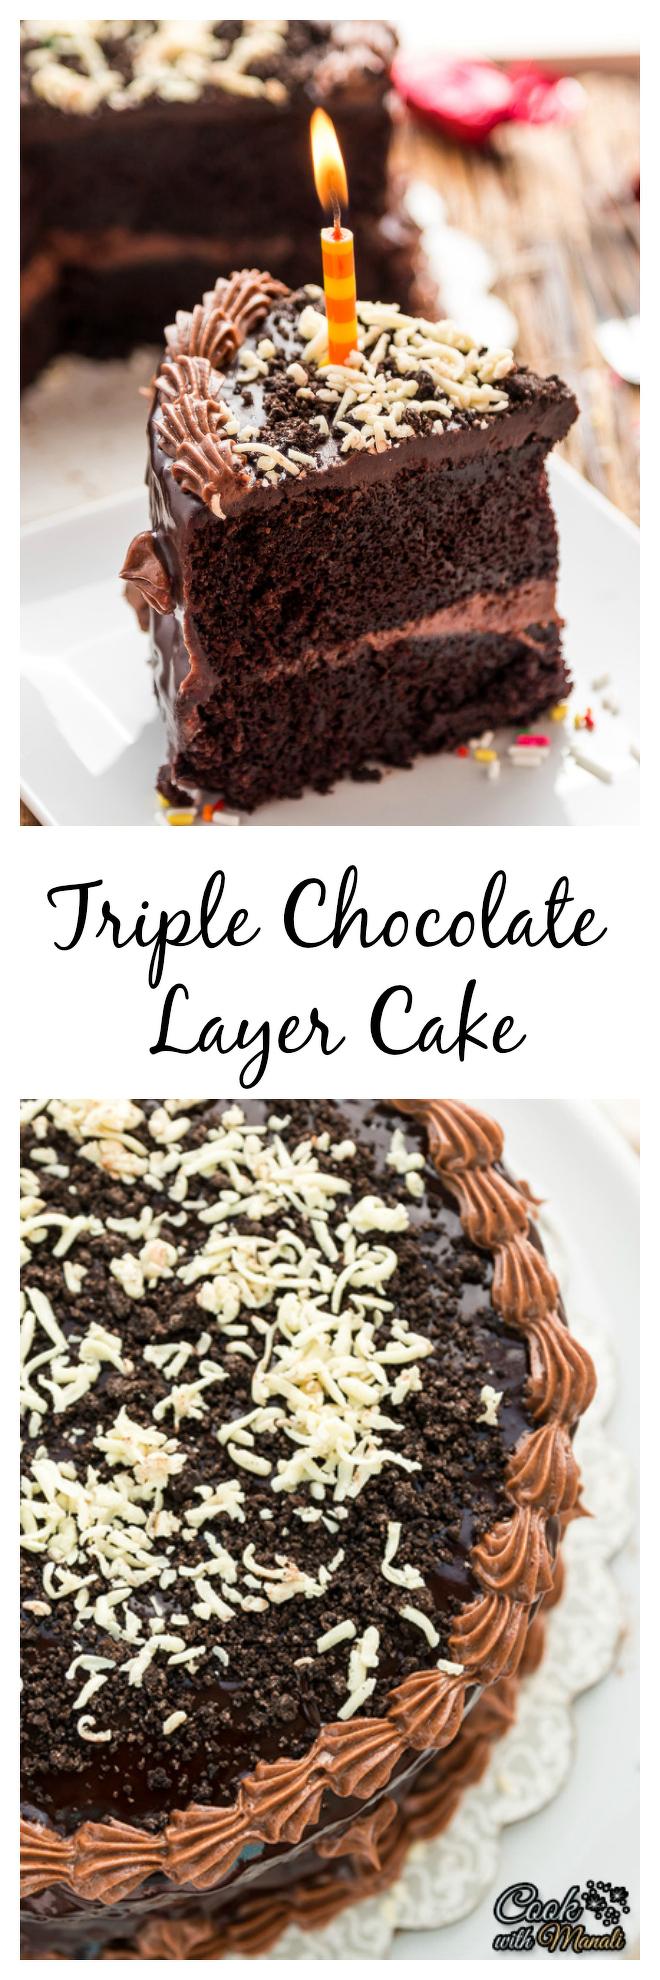 Triple Chocolate Layer Cake Collage-nocwm